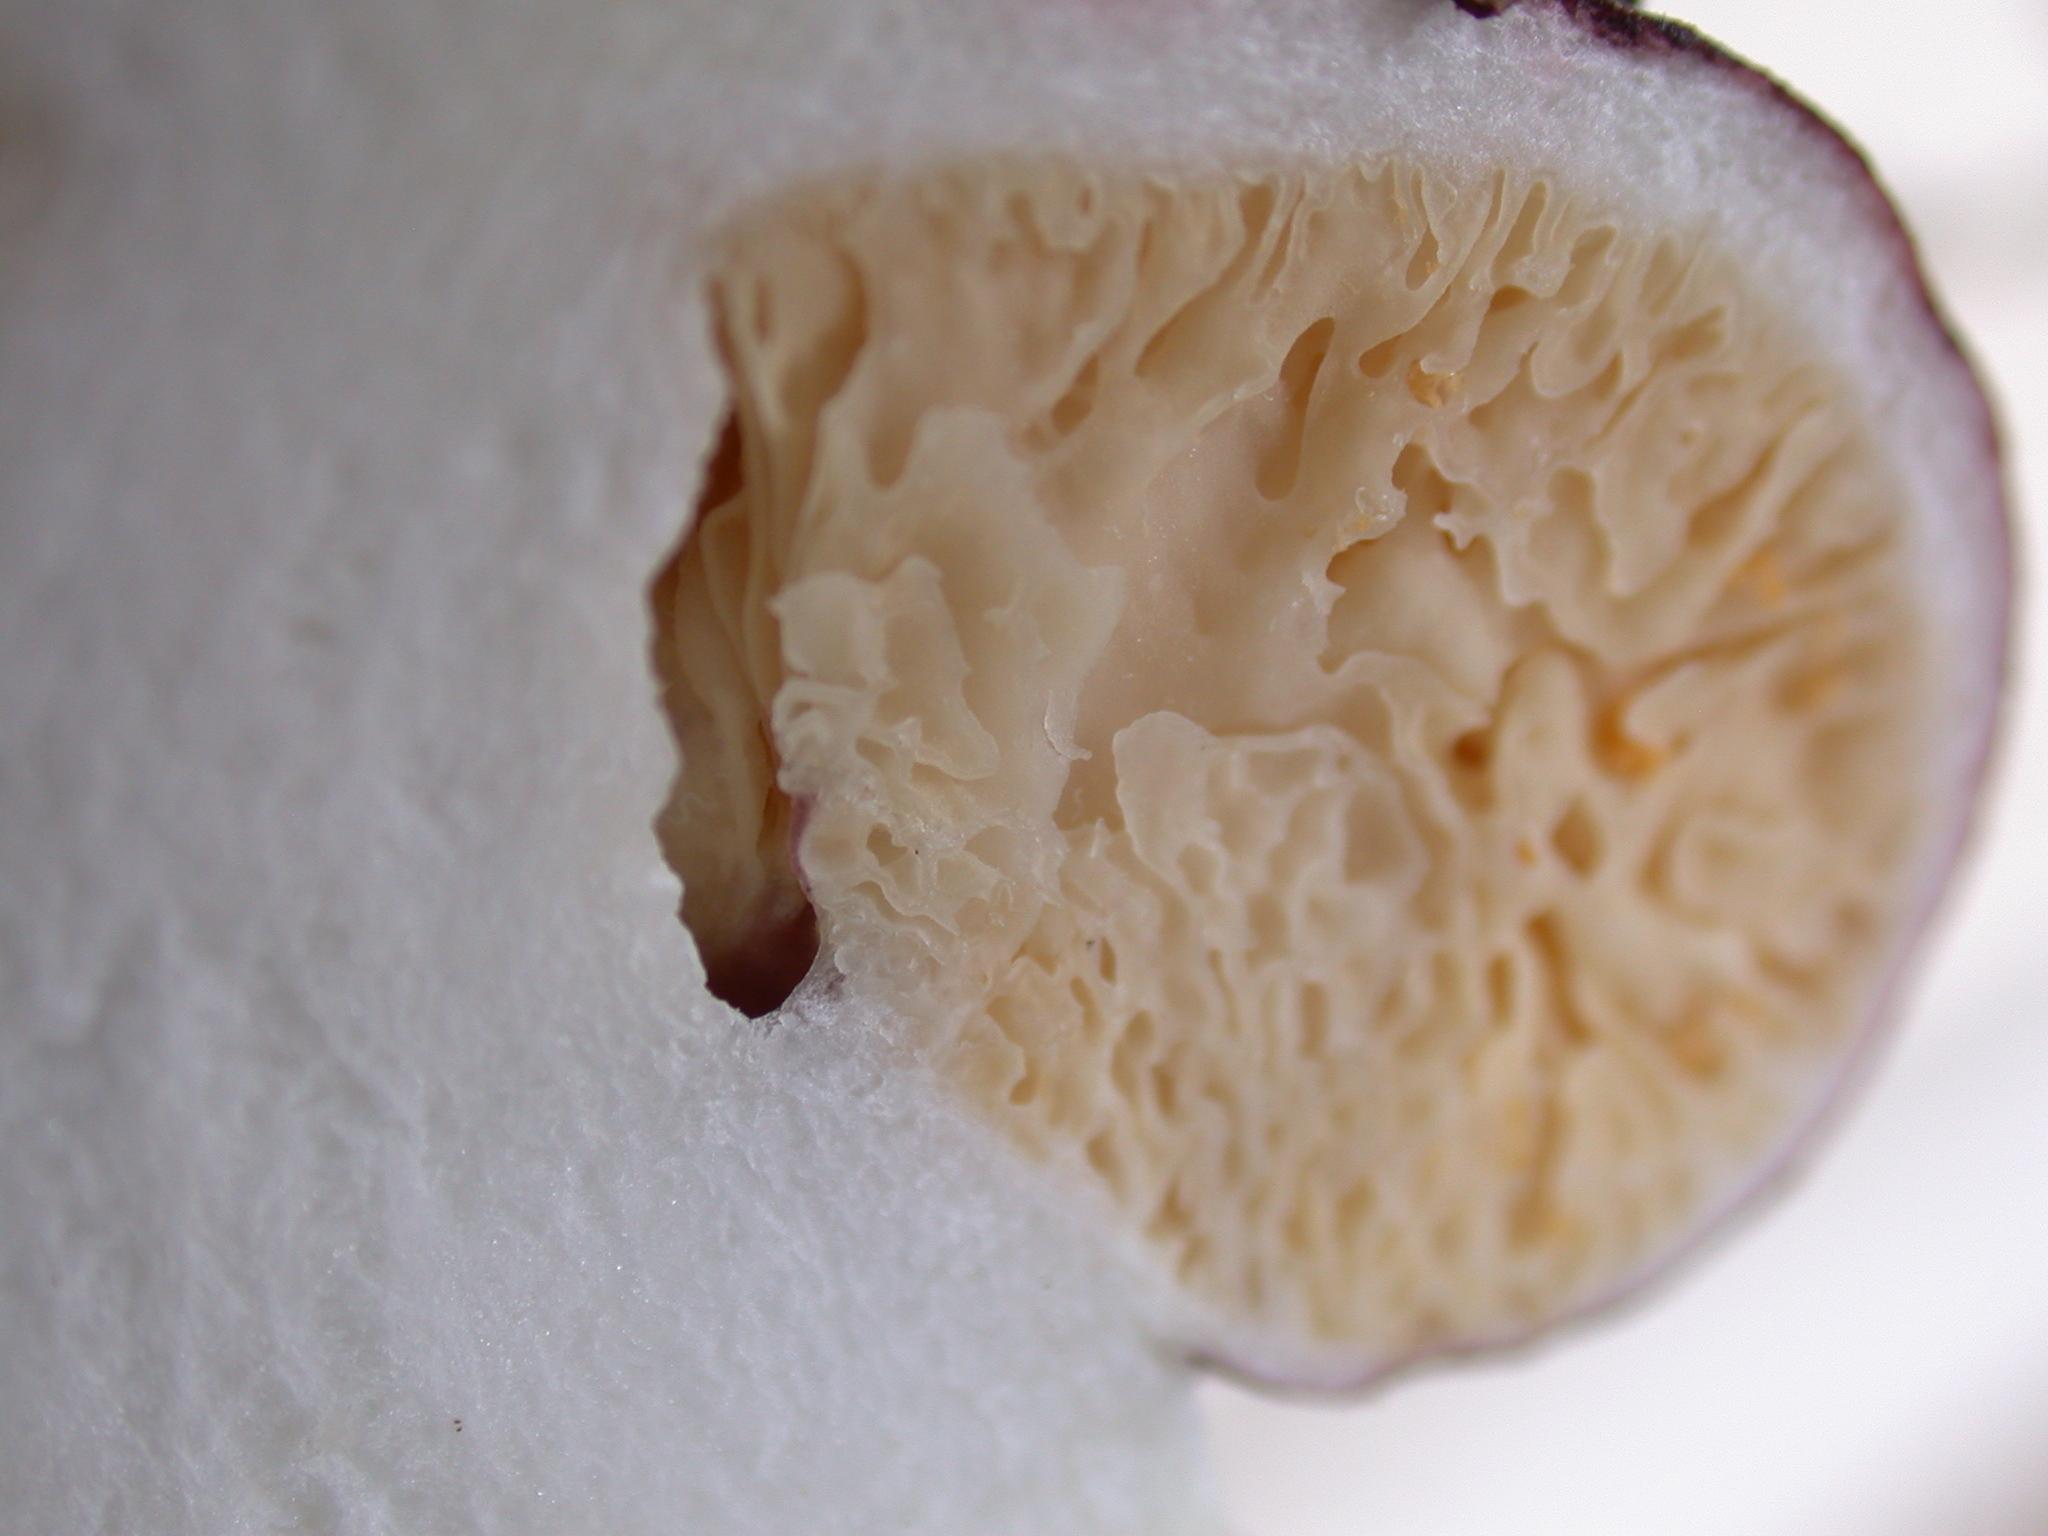 Macowanites nauseosus image